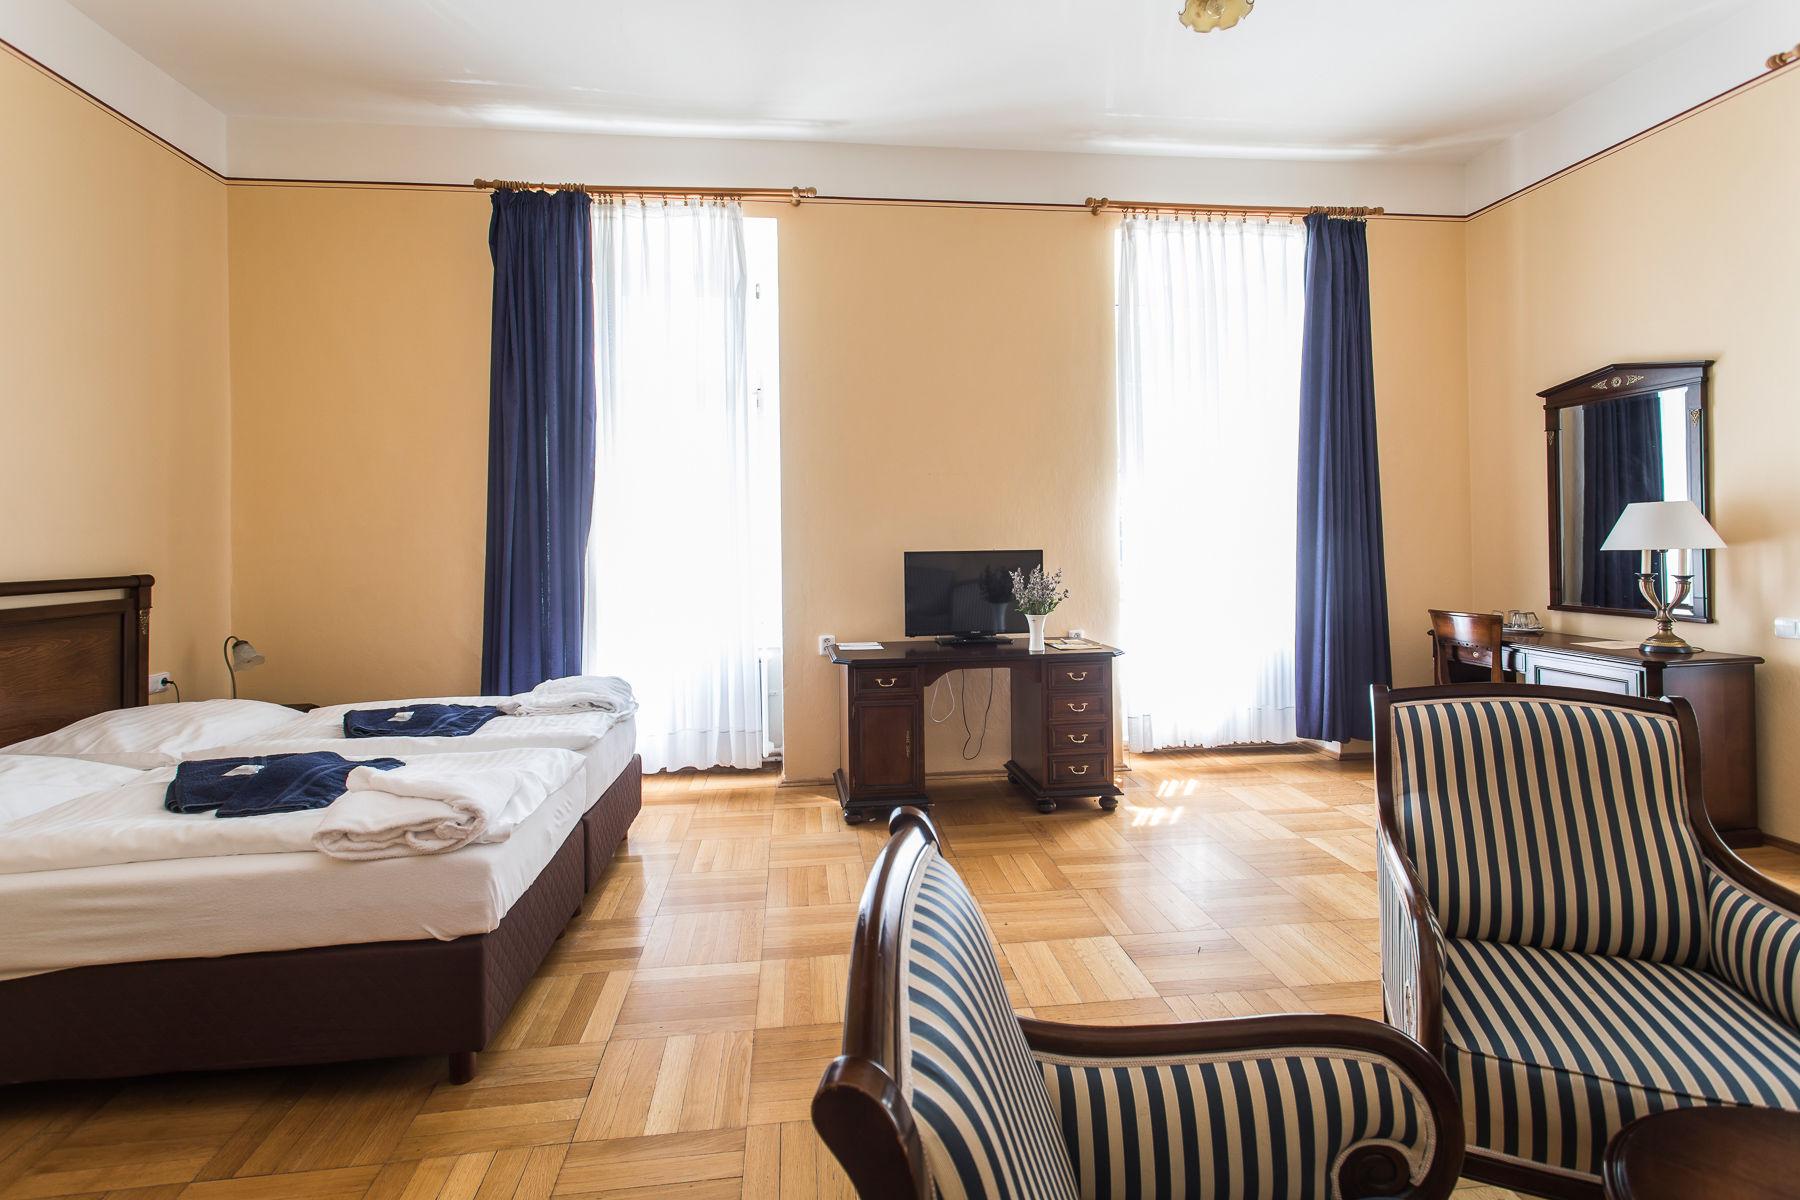 hotelový nábytek